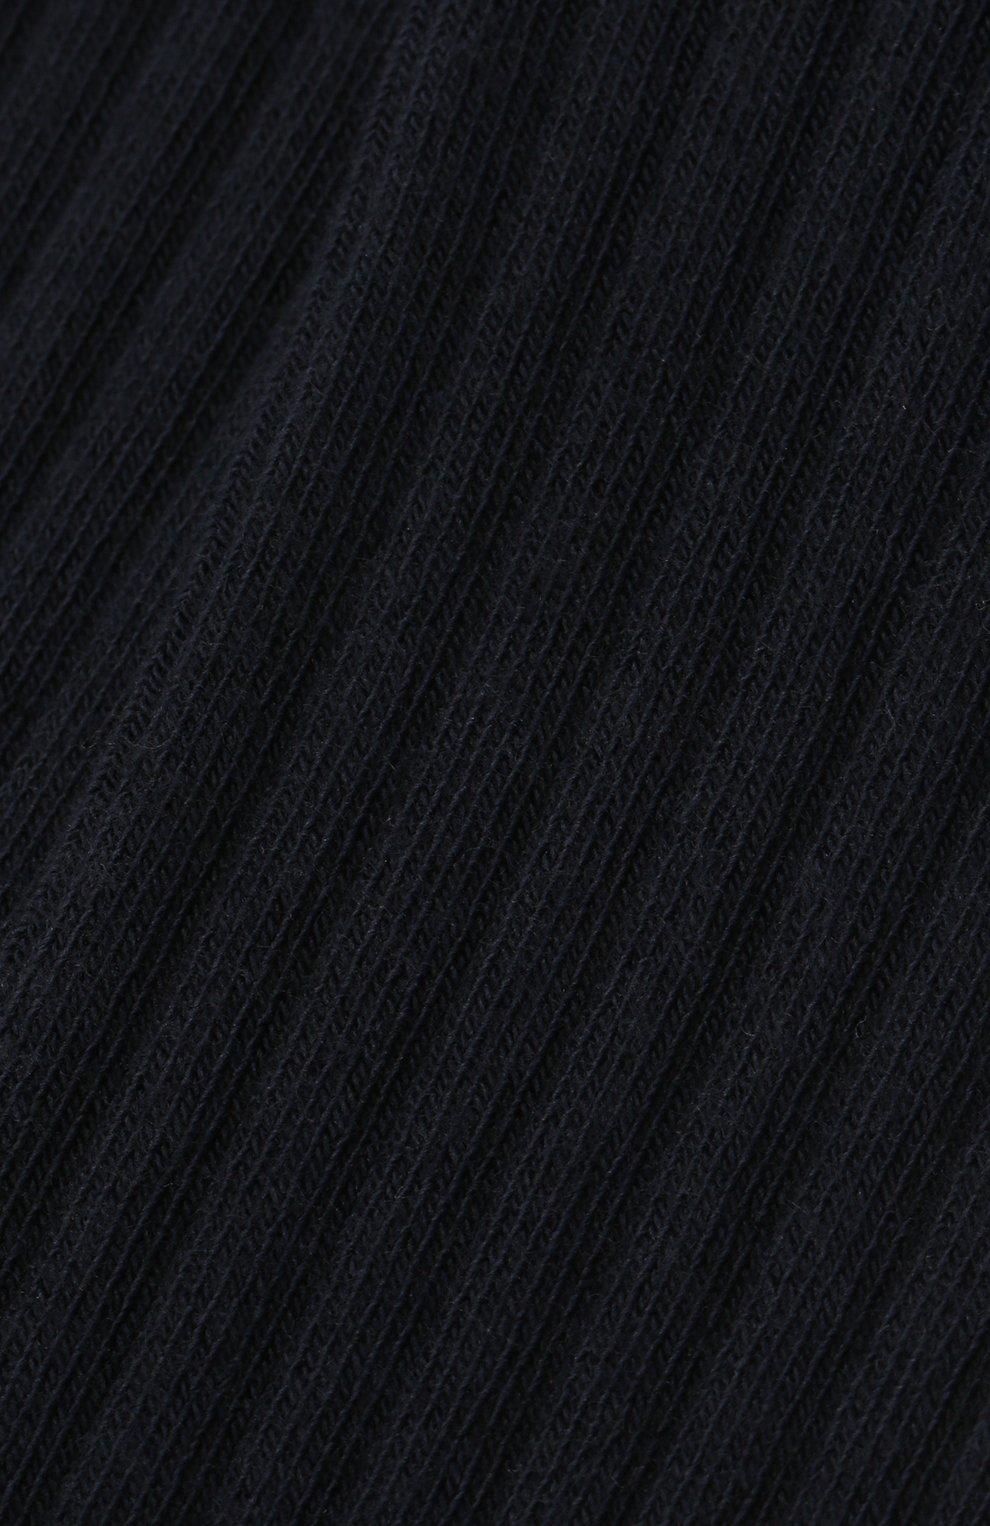 Детские колготки FALKE темно-синего цвета, арт. 13642. | Фото 2 (Материал: Текстиль, Хлопок)